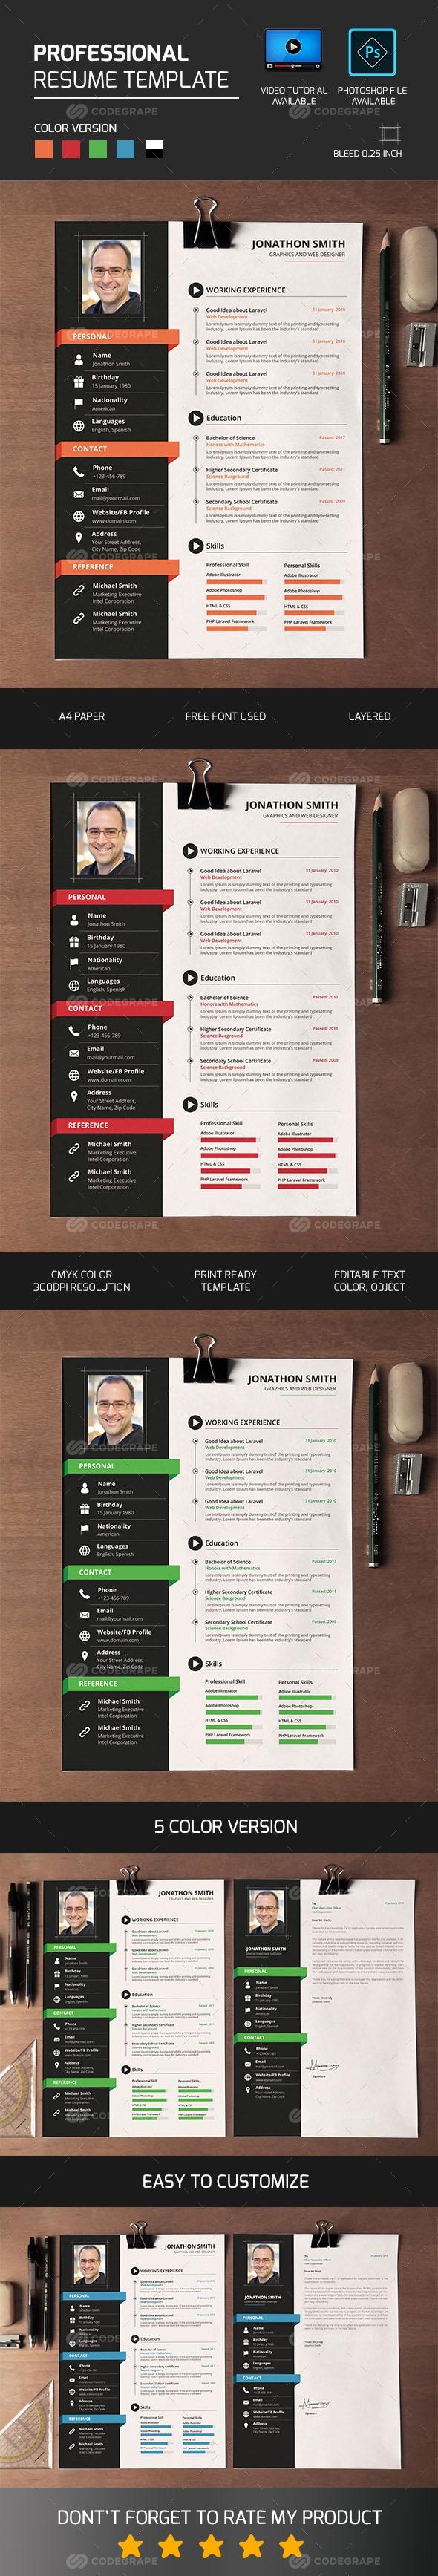 Professional Resume/CV Simple resume template, Resume